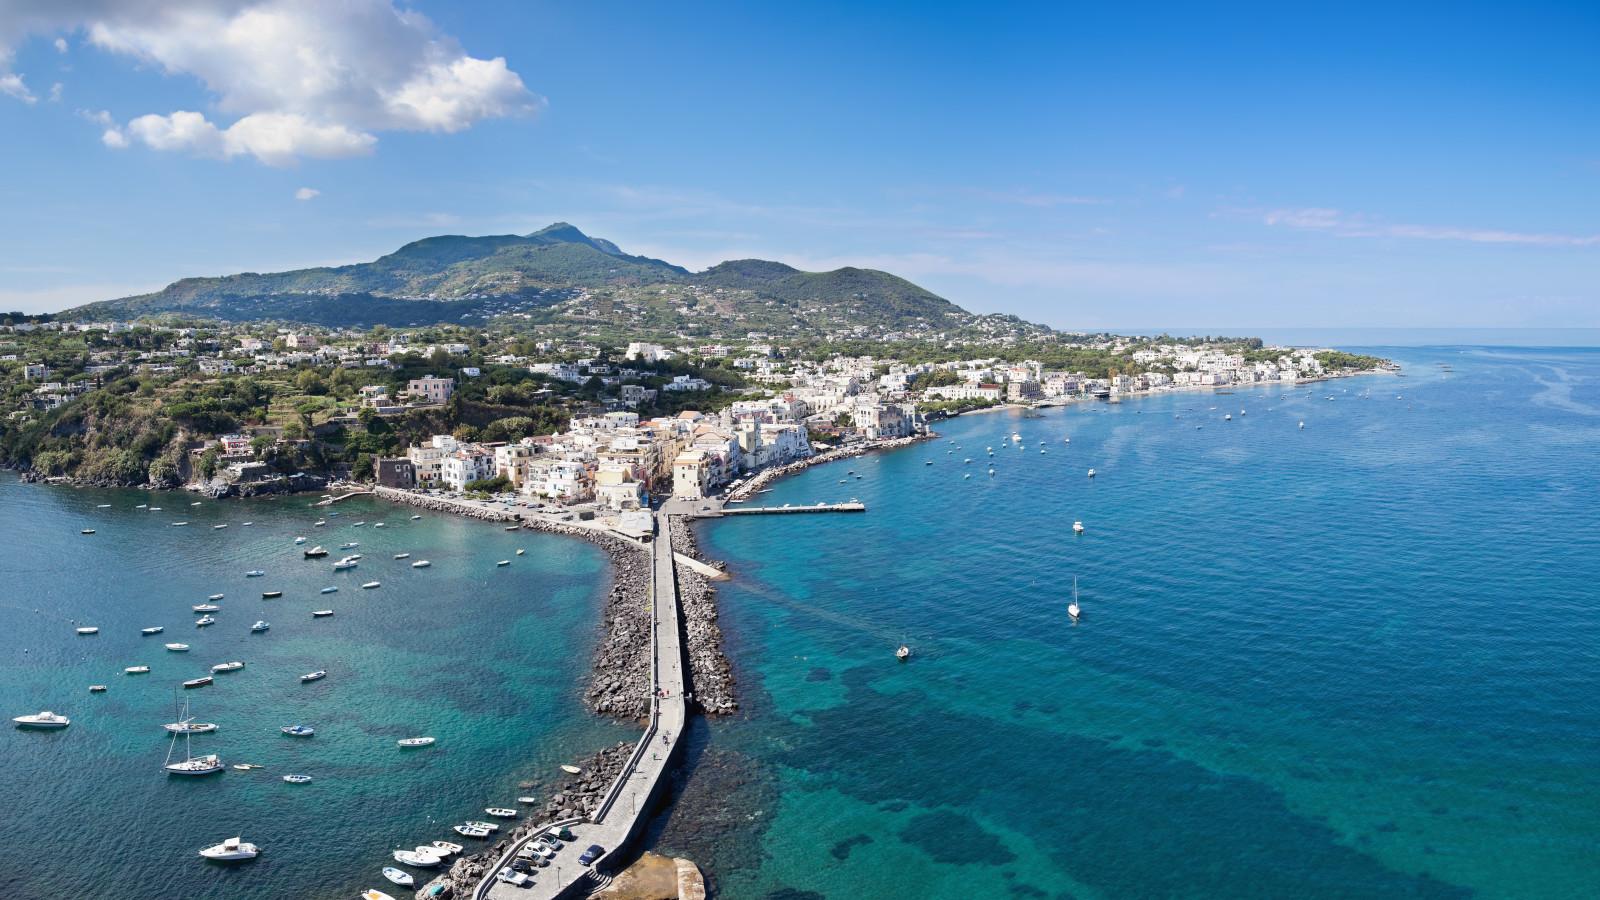 Sorrento Amp The Amalfi Coast Holidays 2015 Topflight